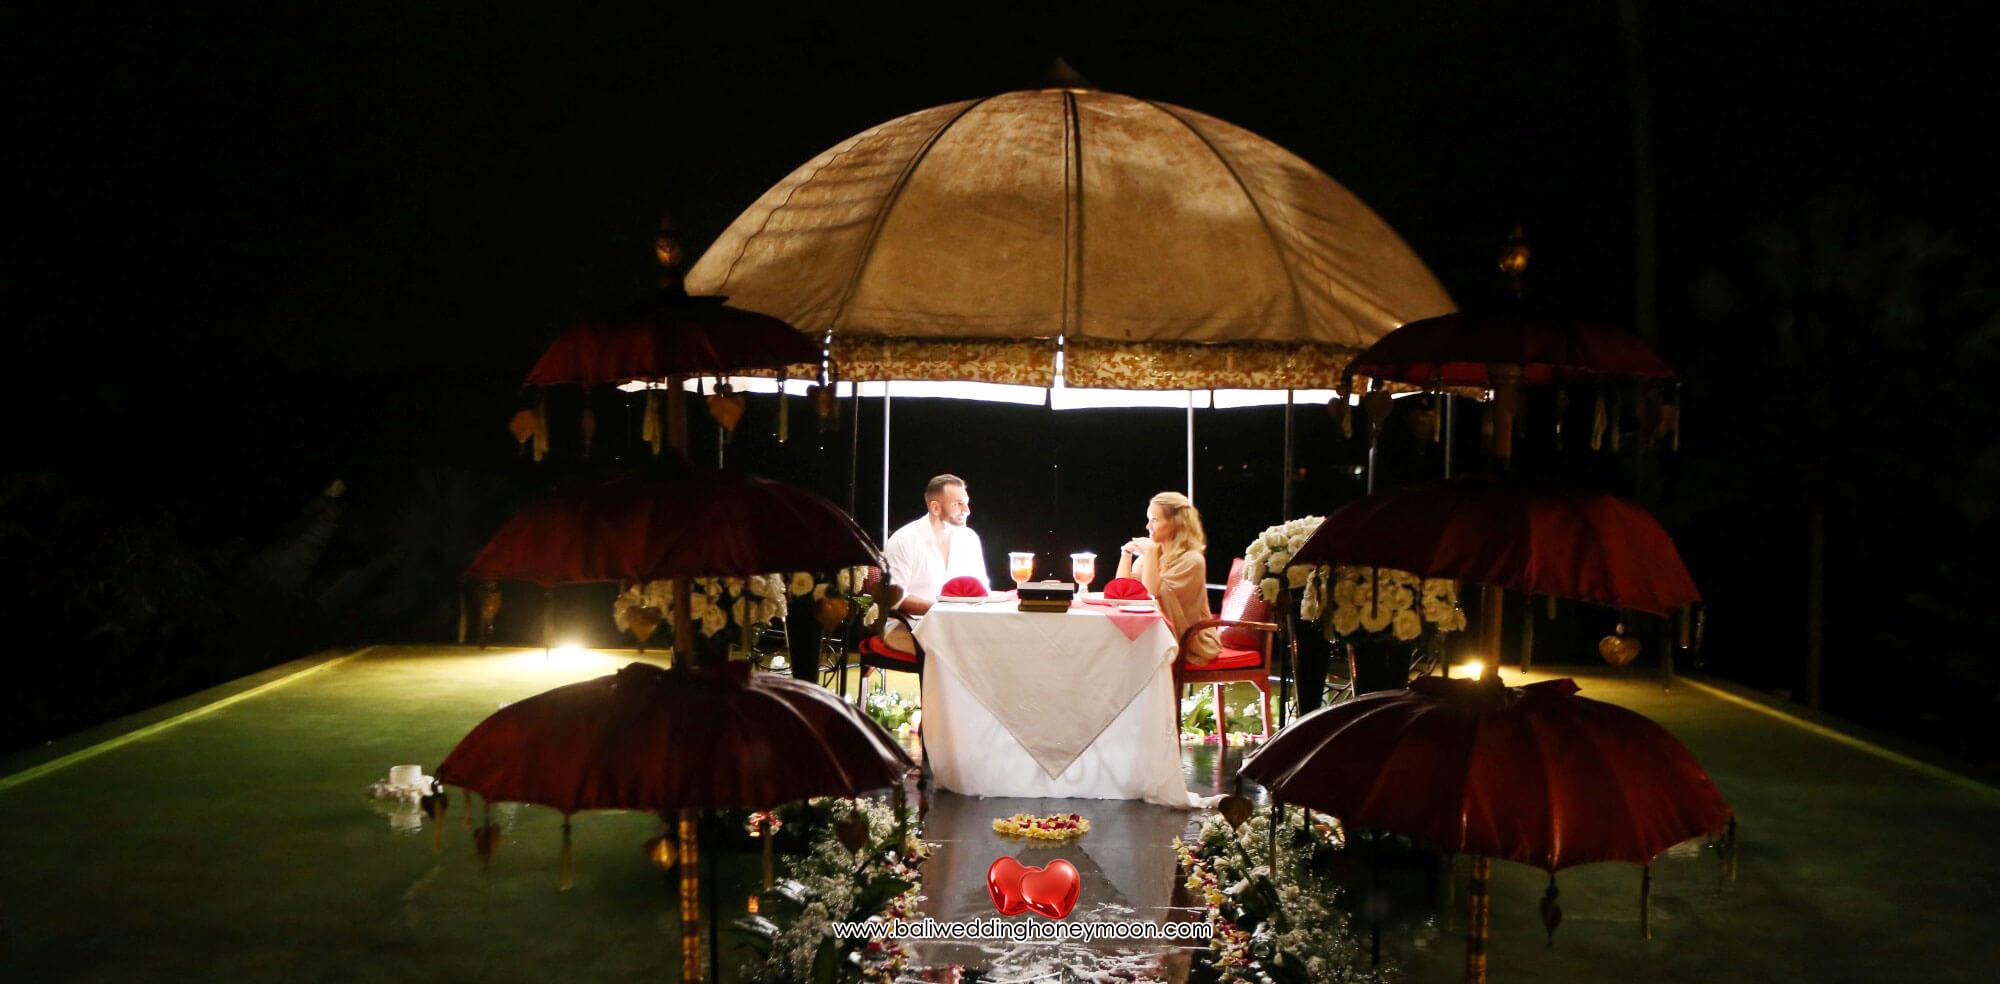 kupukupubarongubudbali-weddingvenuebali-uniquebaliwedding-baliweddinghoneymoon-baliweddingorganizer-baliweddingplanner-baliweddingpackage